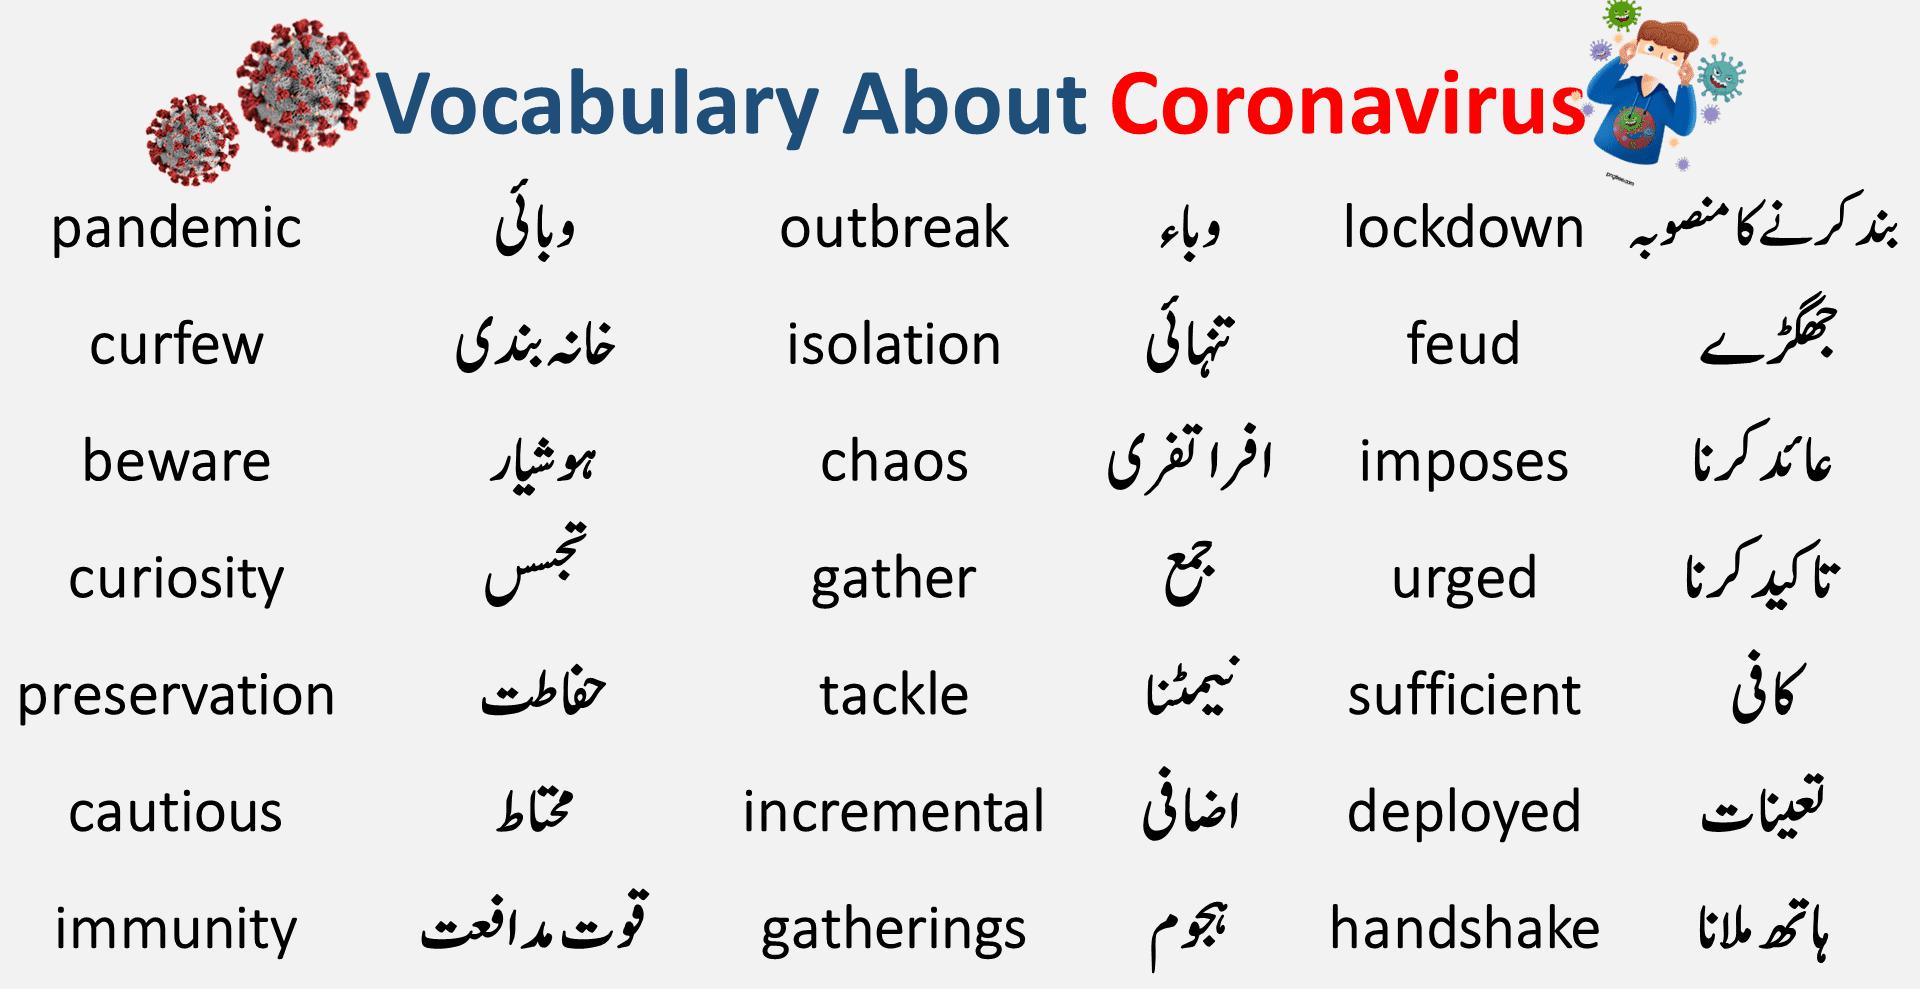 Vocabulary About Coronavirus